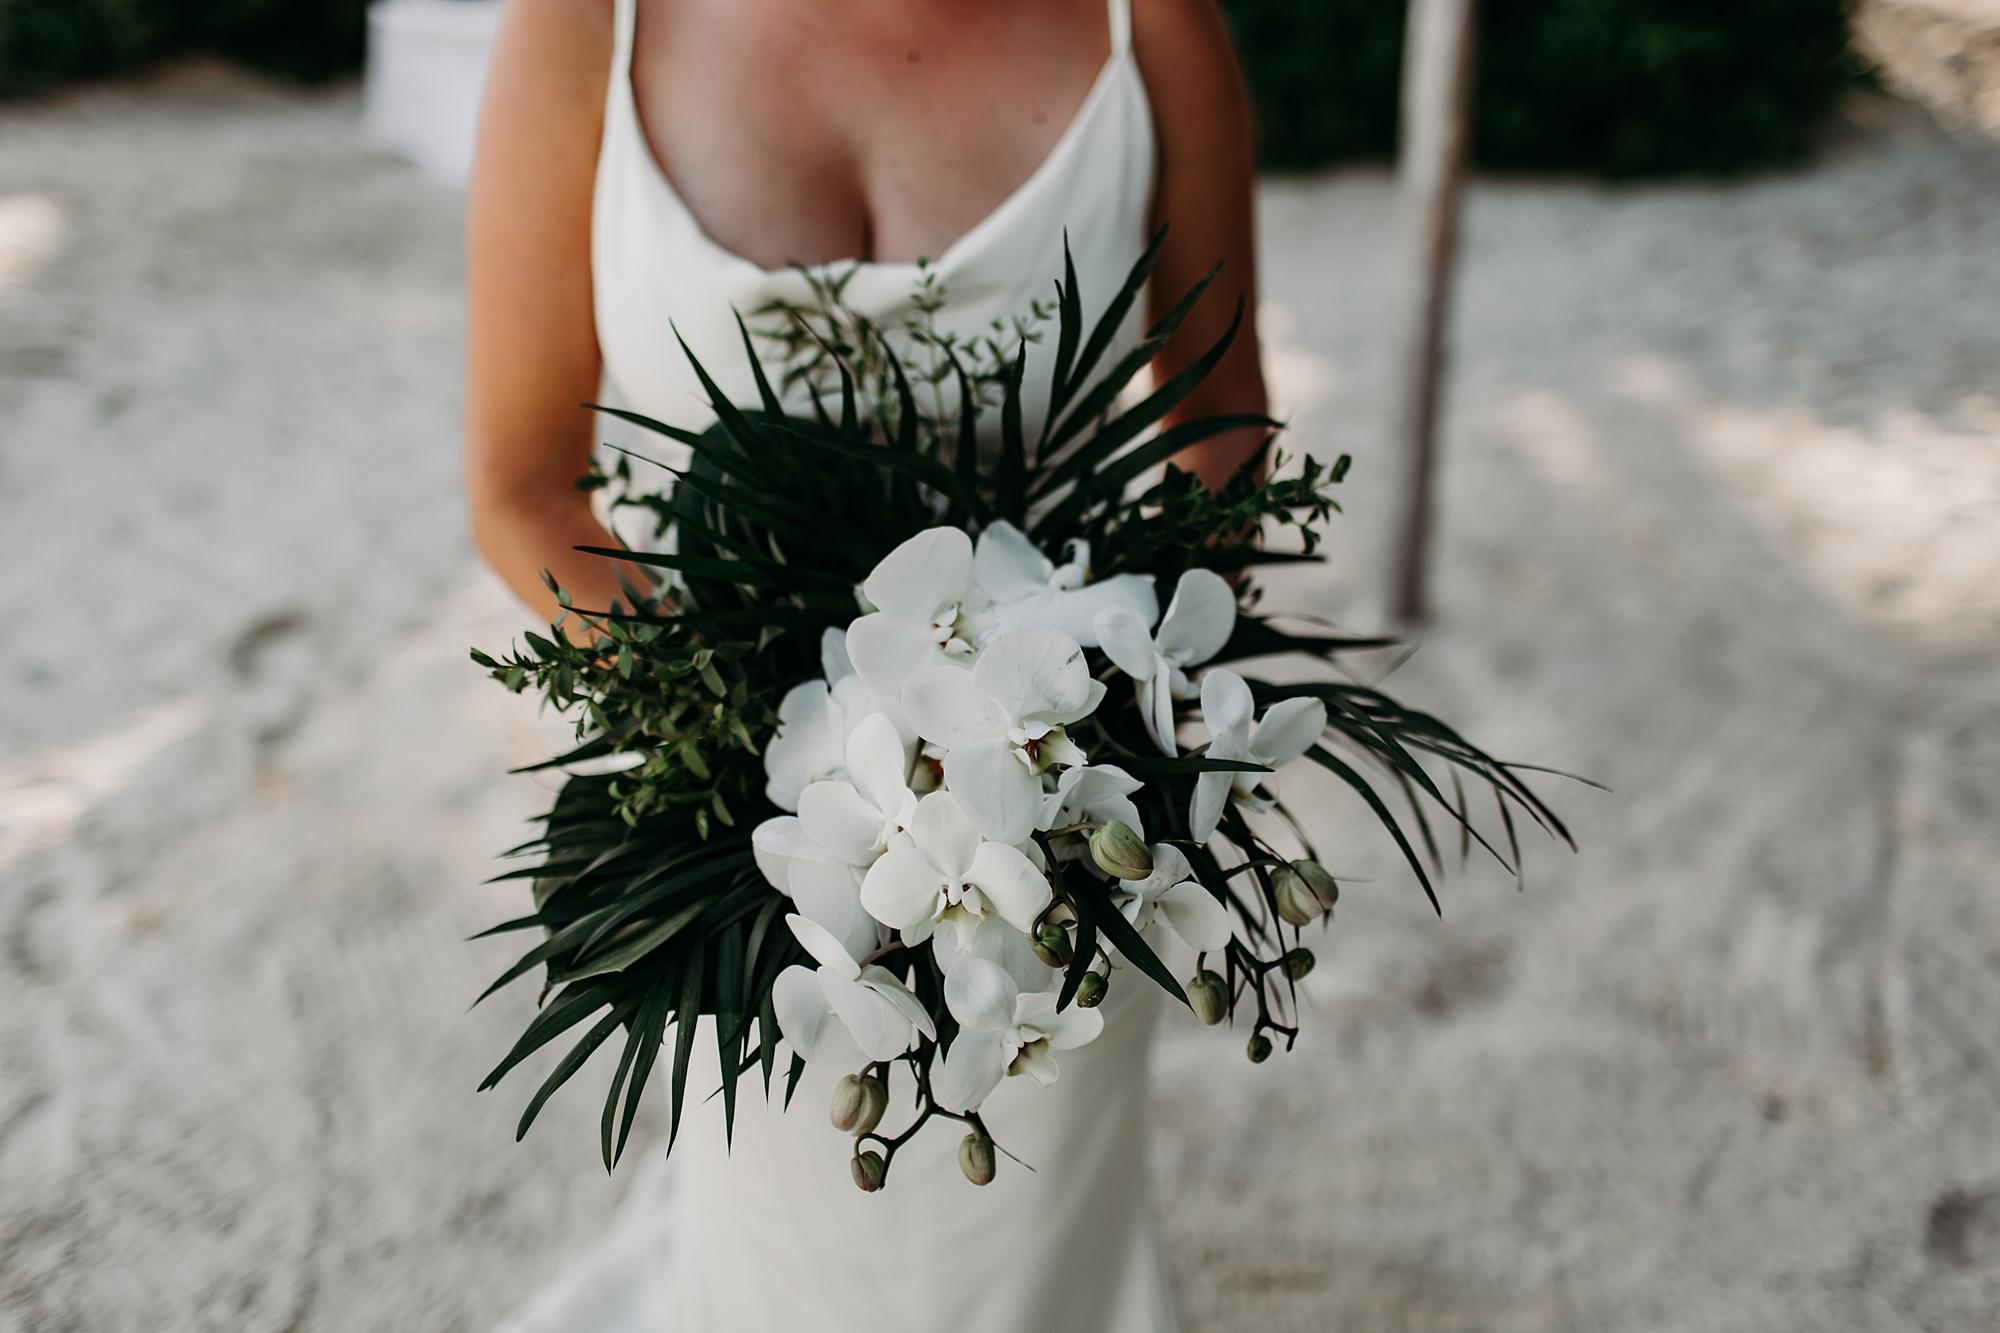 Danielle-San-Antonio-Wedding-Photographer-83_WEB.jpg